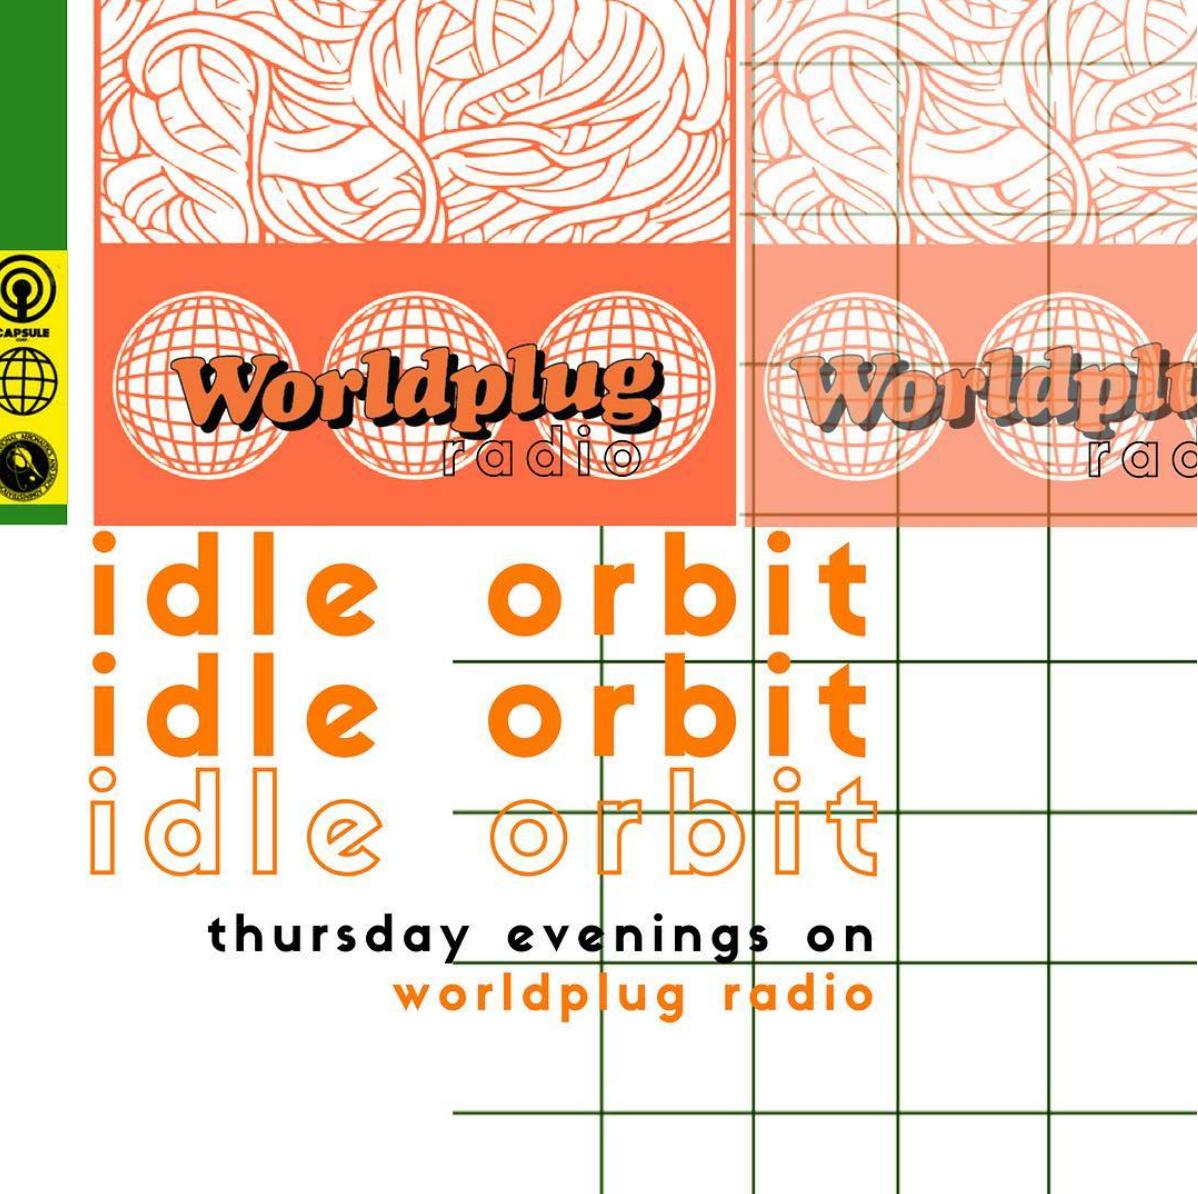 Listen to IDLE ORBIT episodes 001 and 002